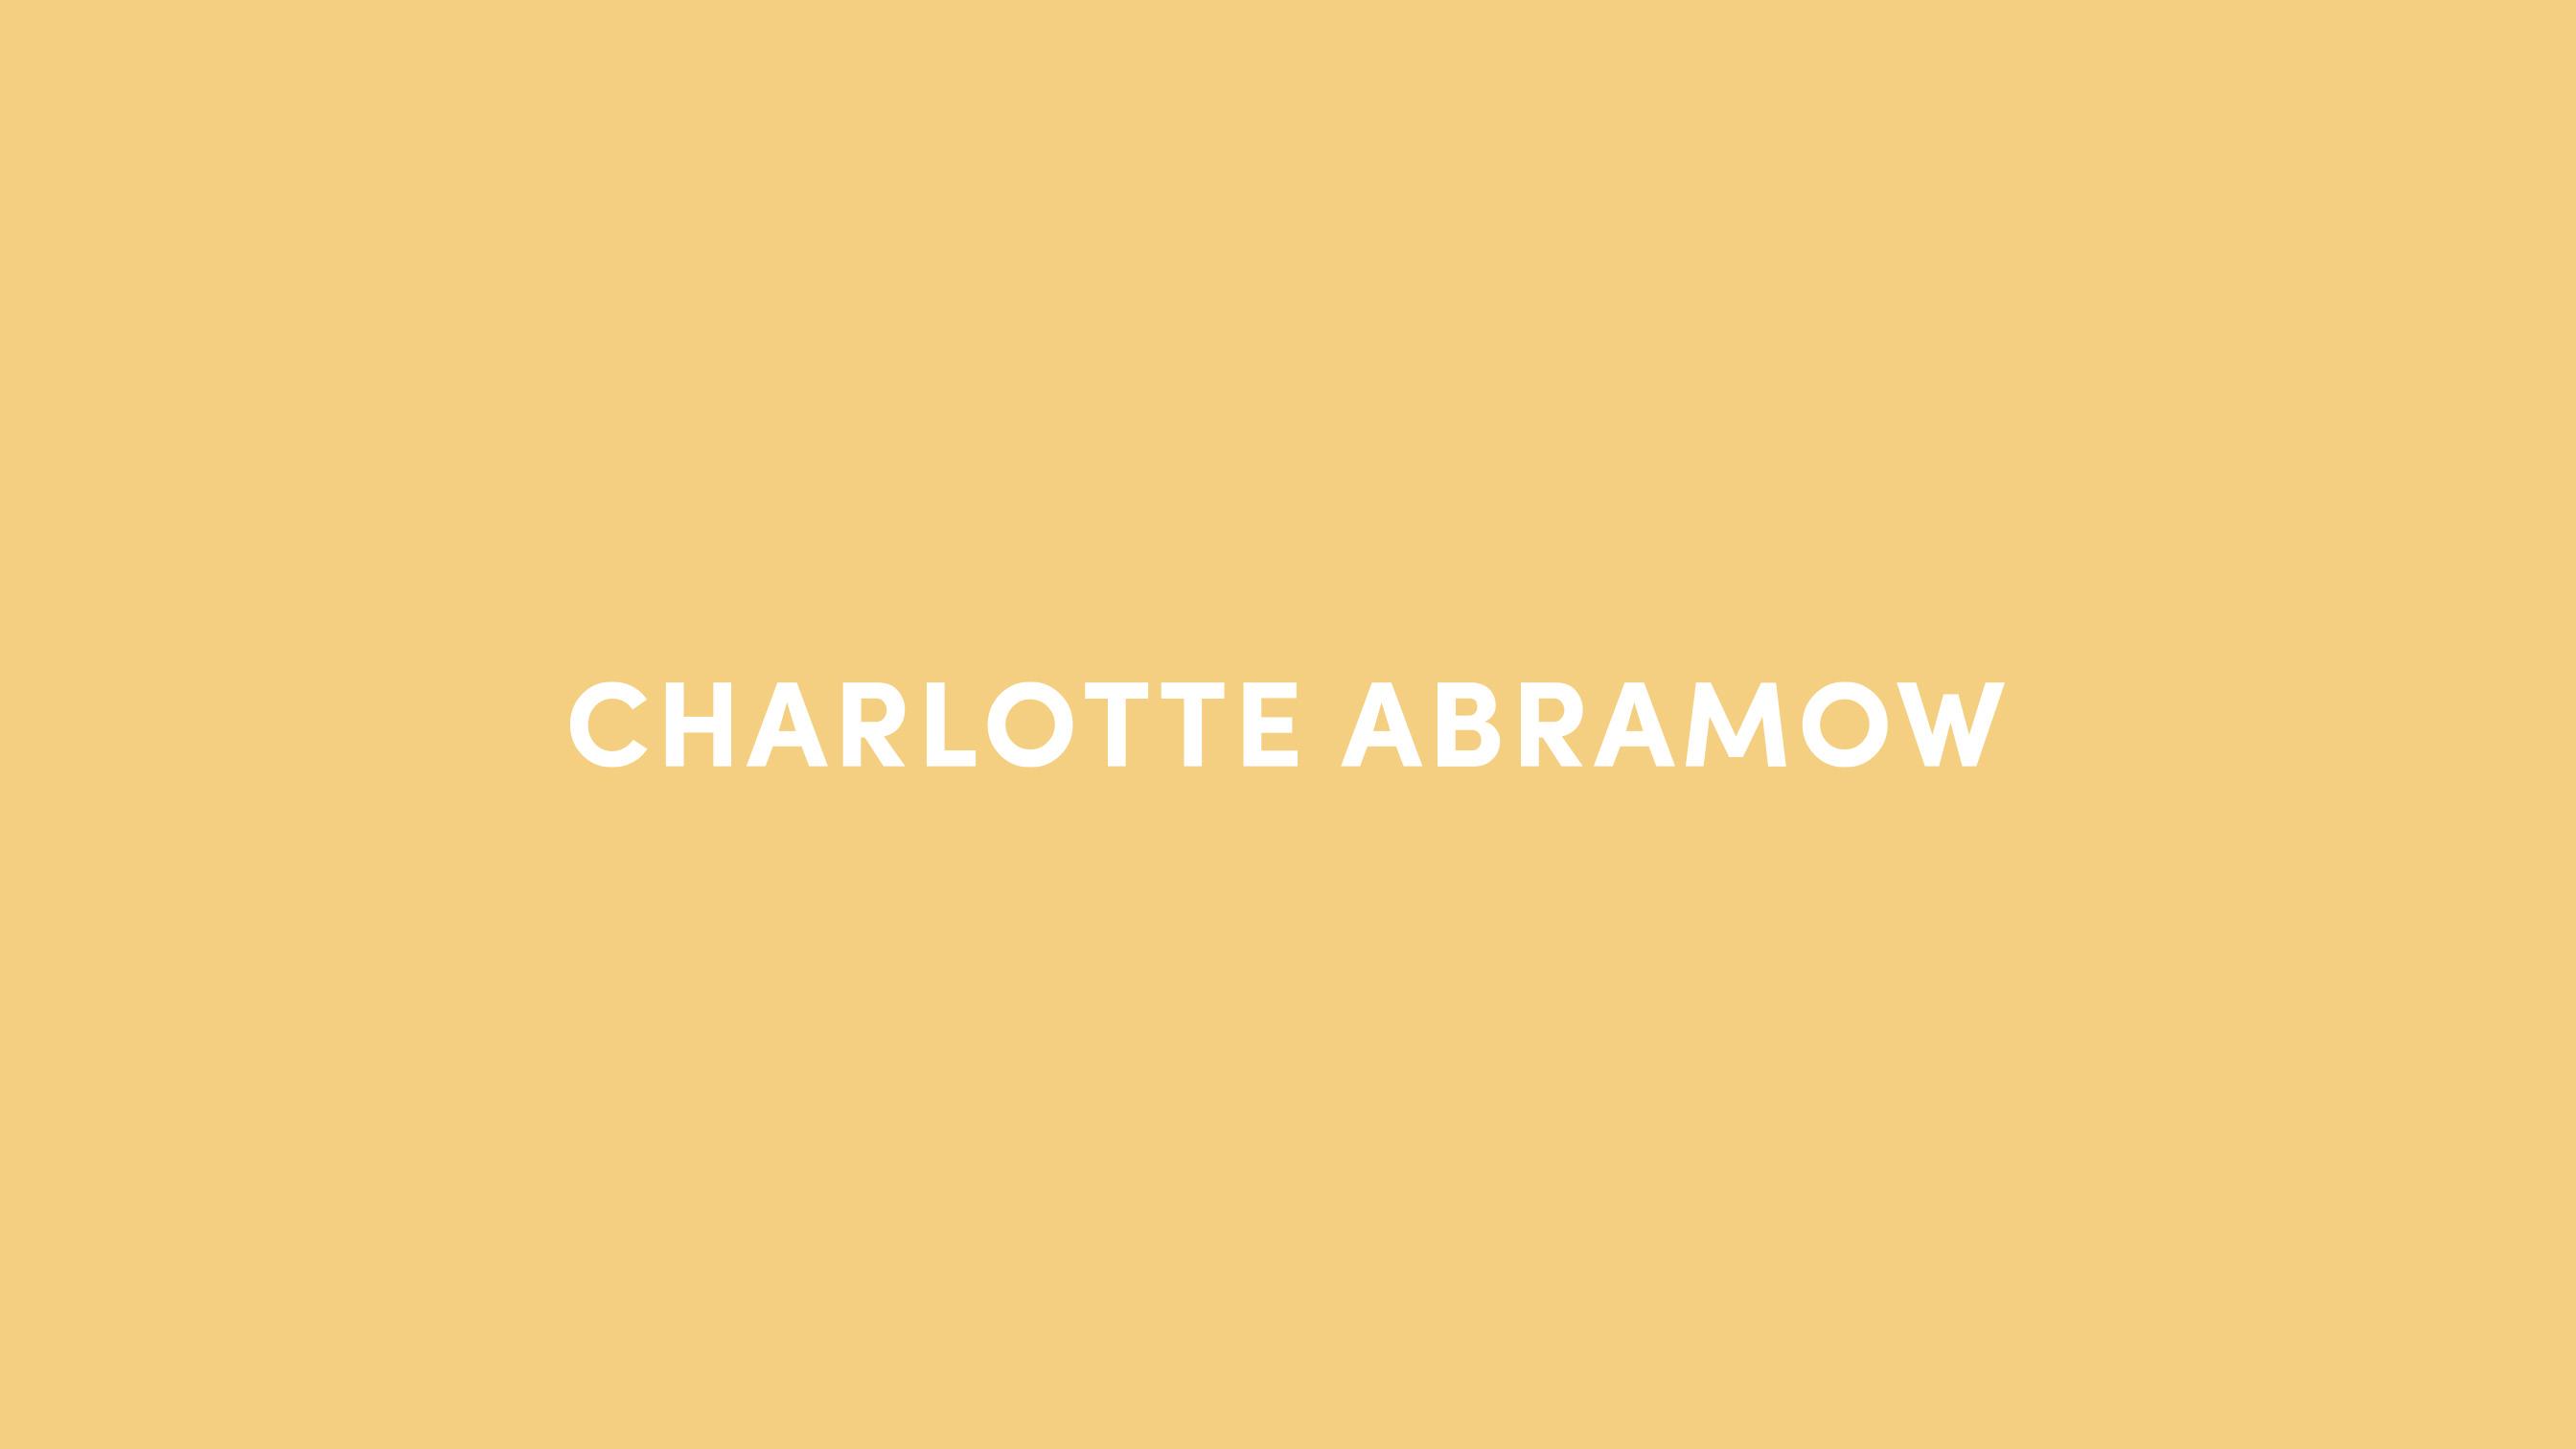 01-charlotte-abramow-pikteo-webdesign-graphic-design-freelance-paris-bruxelles-londres